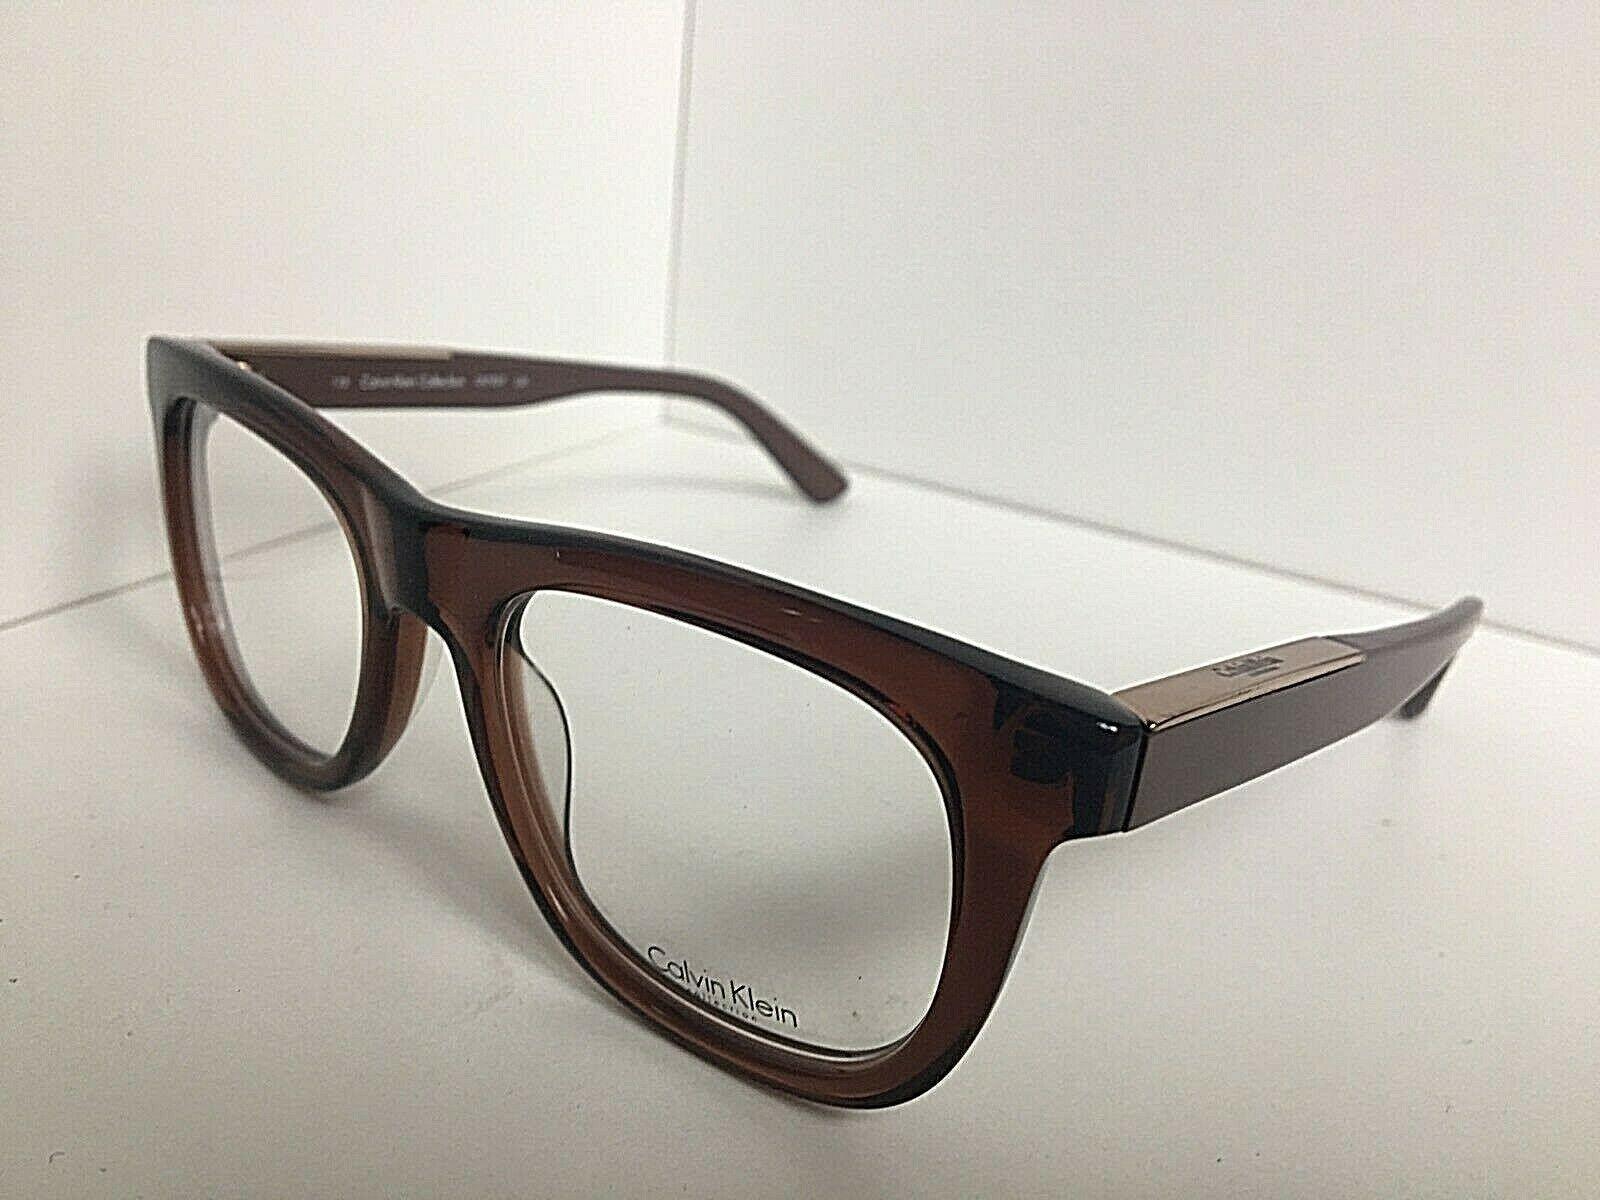 New Calvin Klein CK 2779 332 51mm Clear Brown Eyeglasses Frame